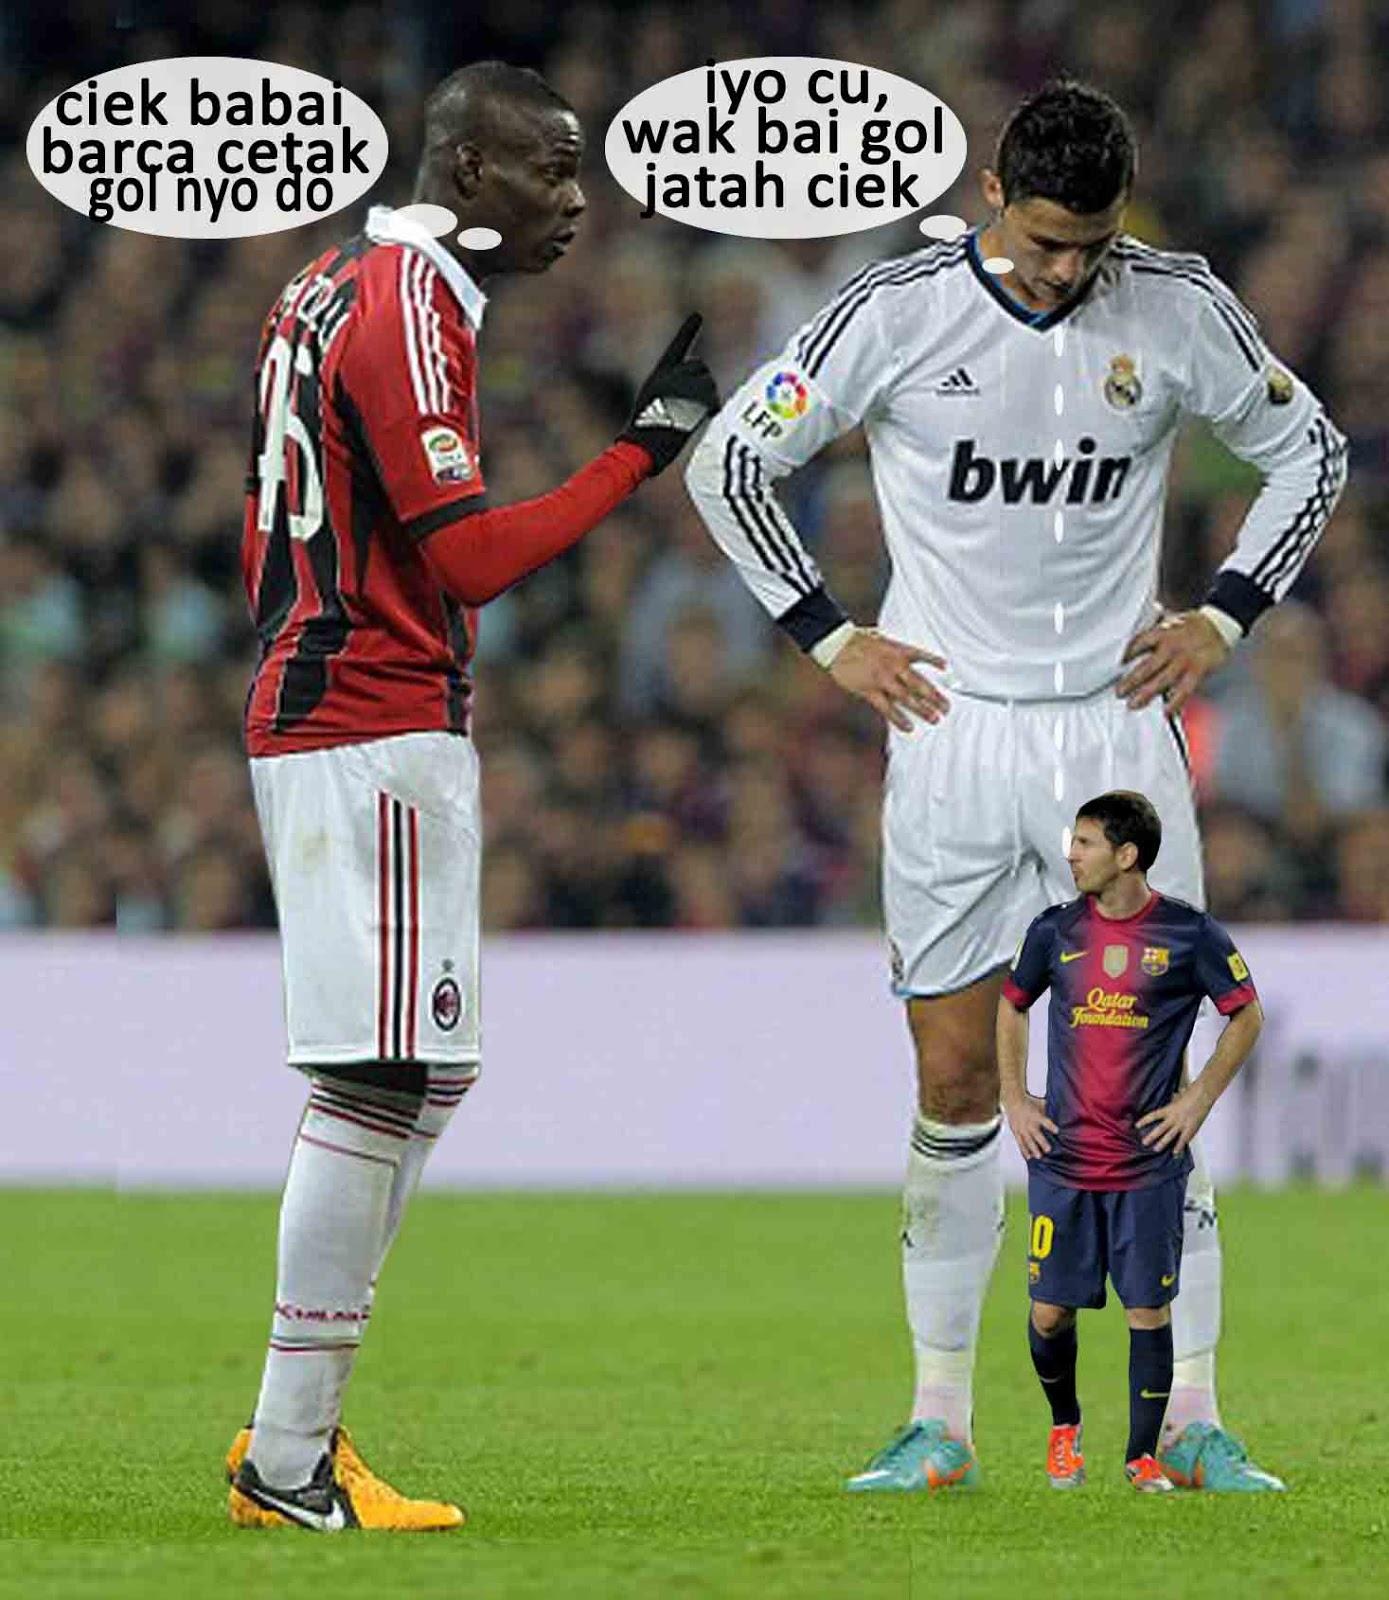 Gambar Bola Lucu  Pertanyaan lucu Balotelli terhadap